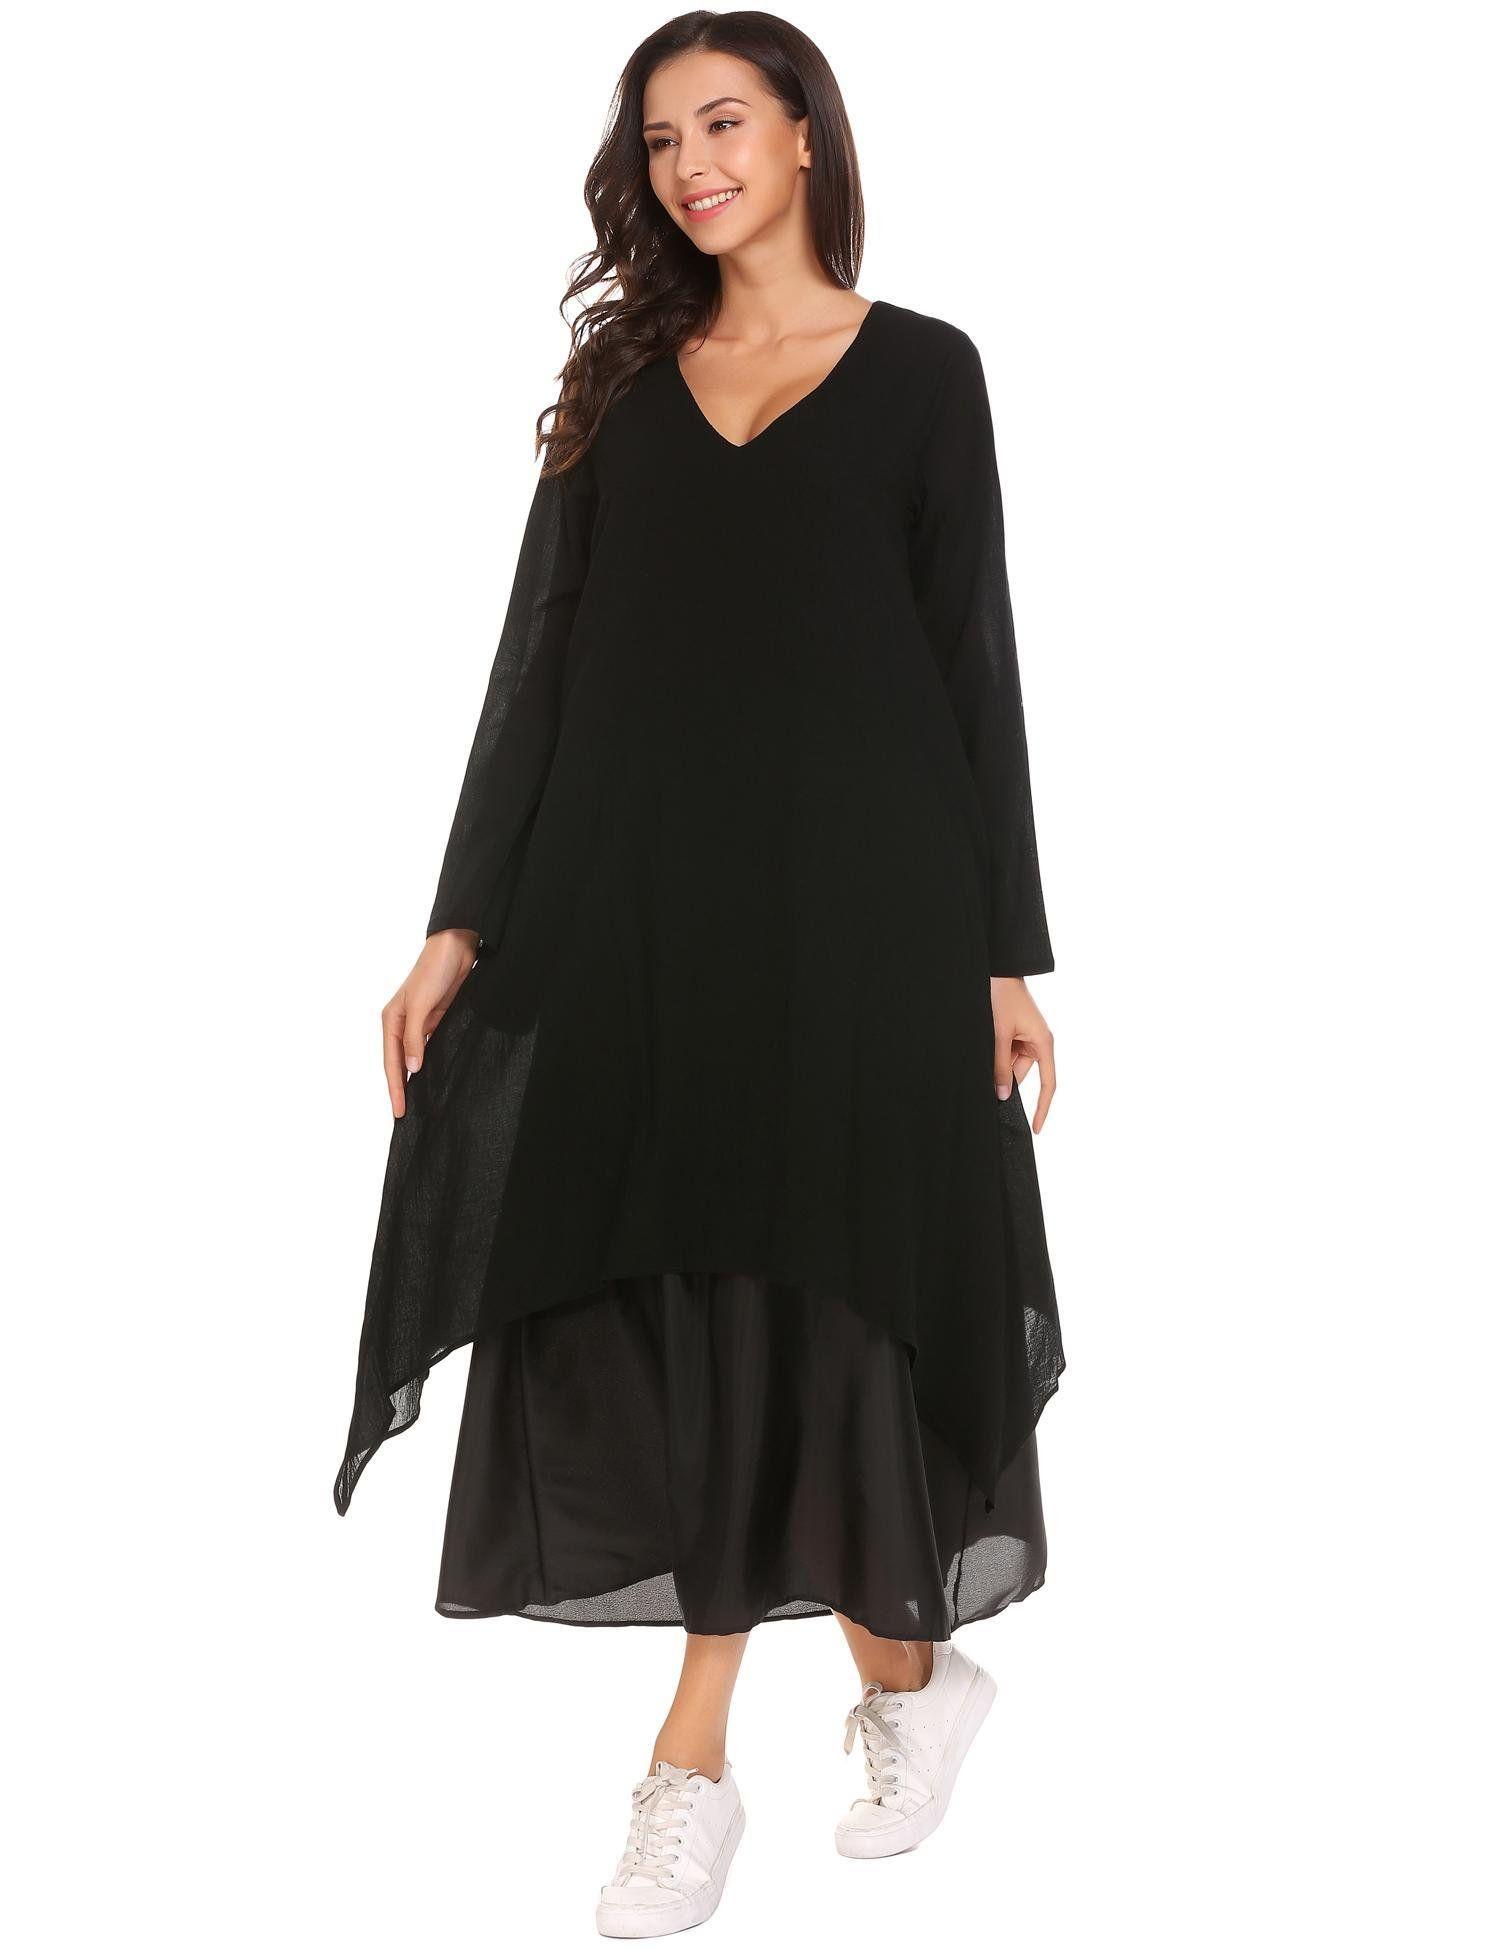 Elover women v neck boho long maxi dress vintage loose long sleeve